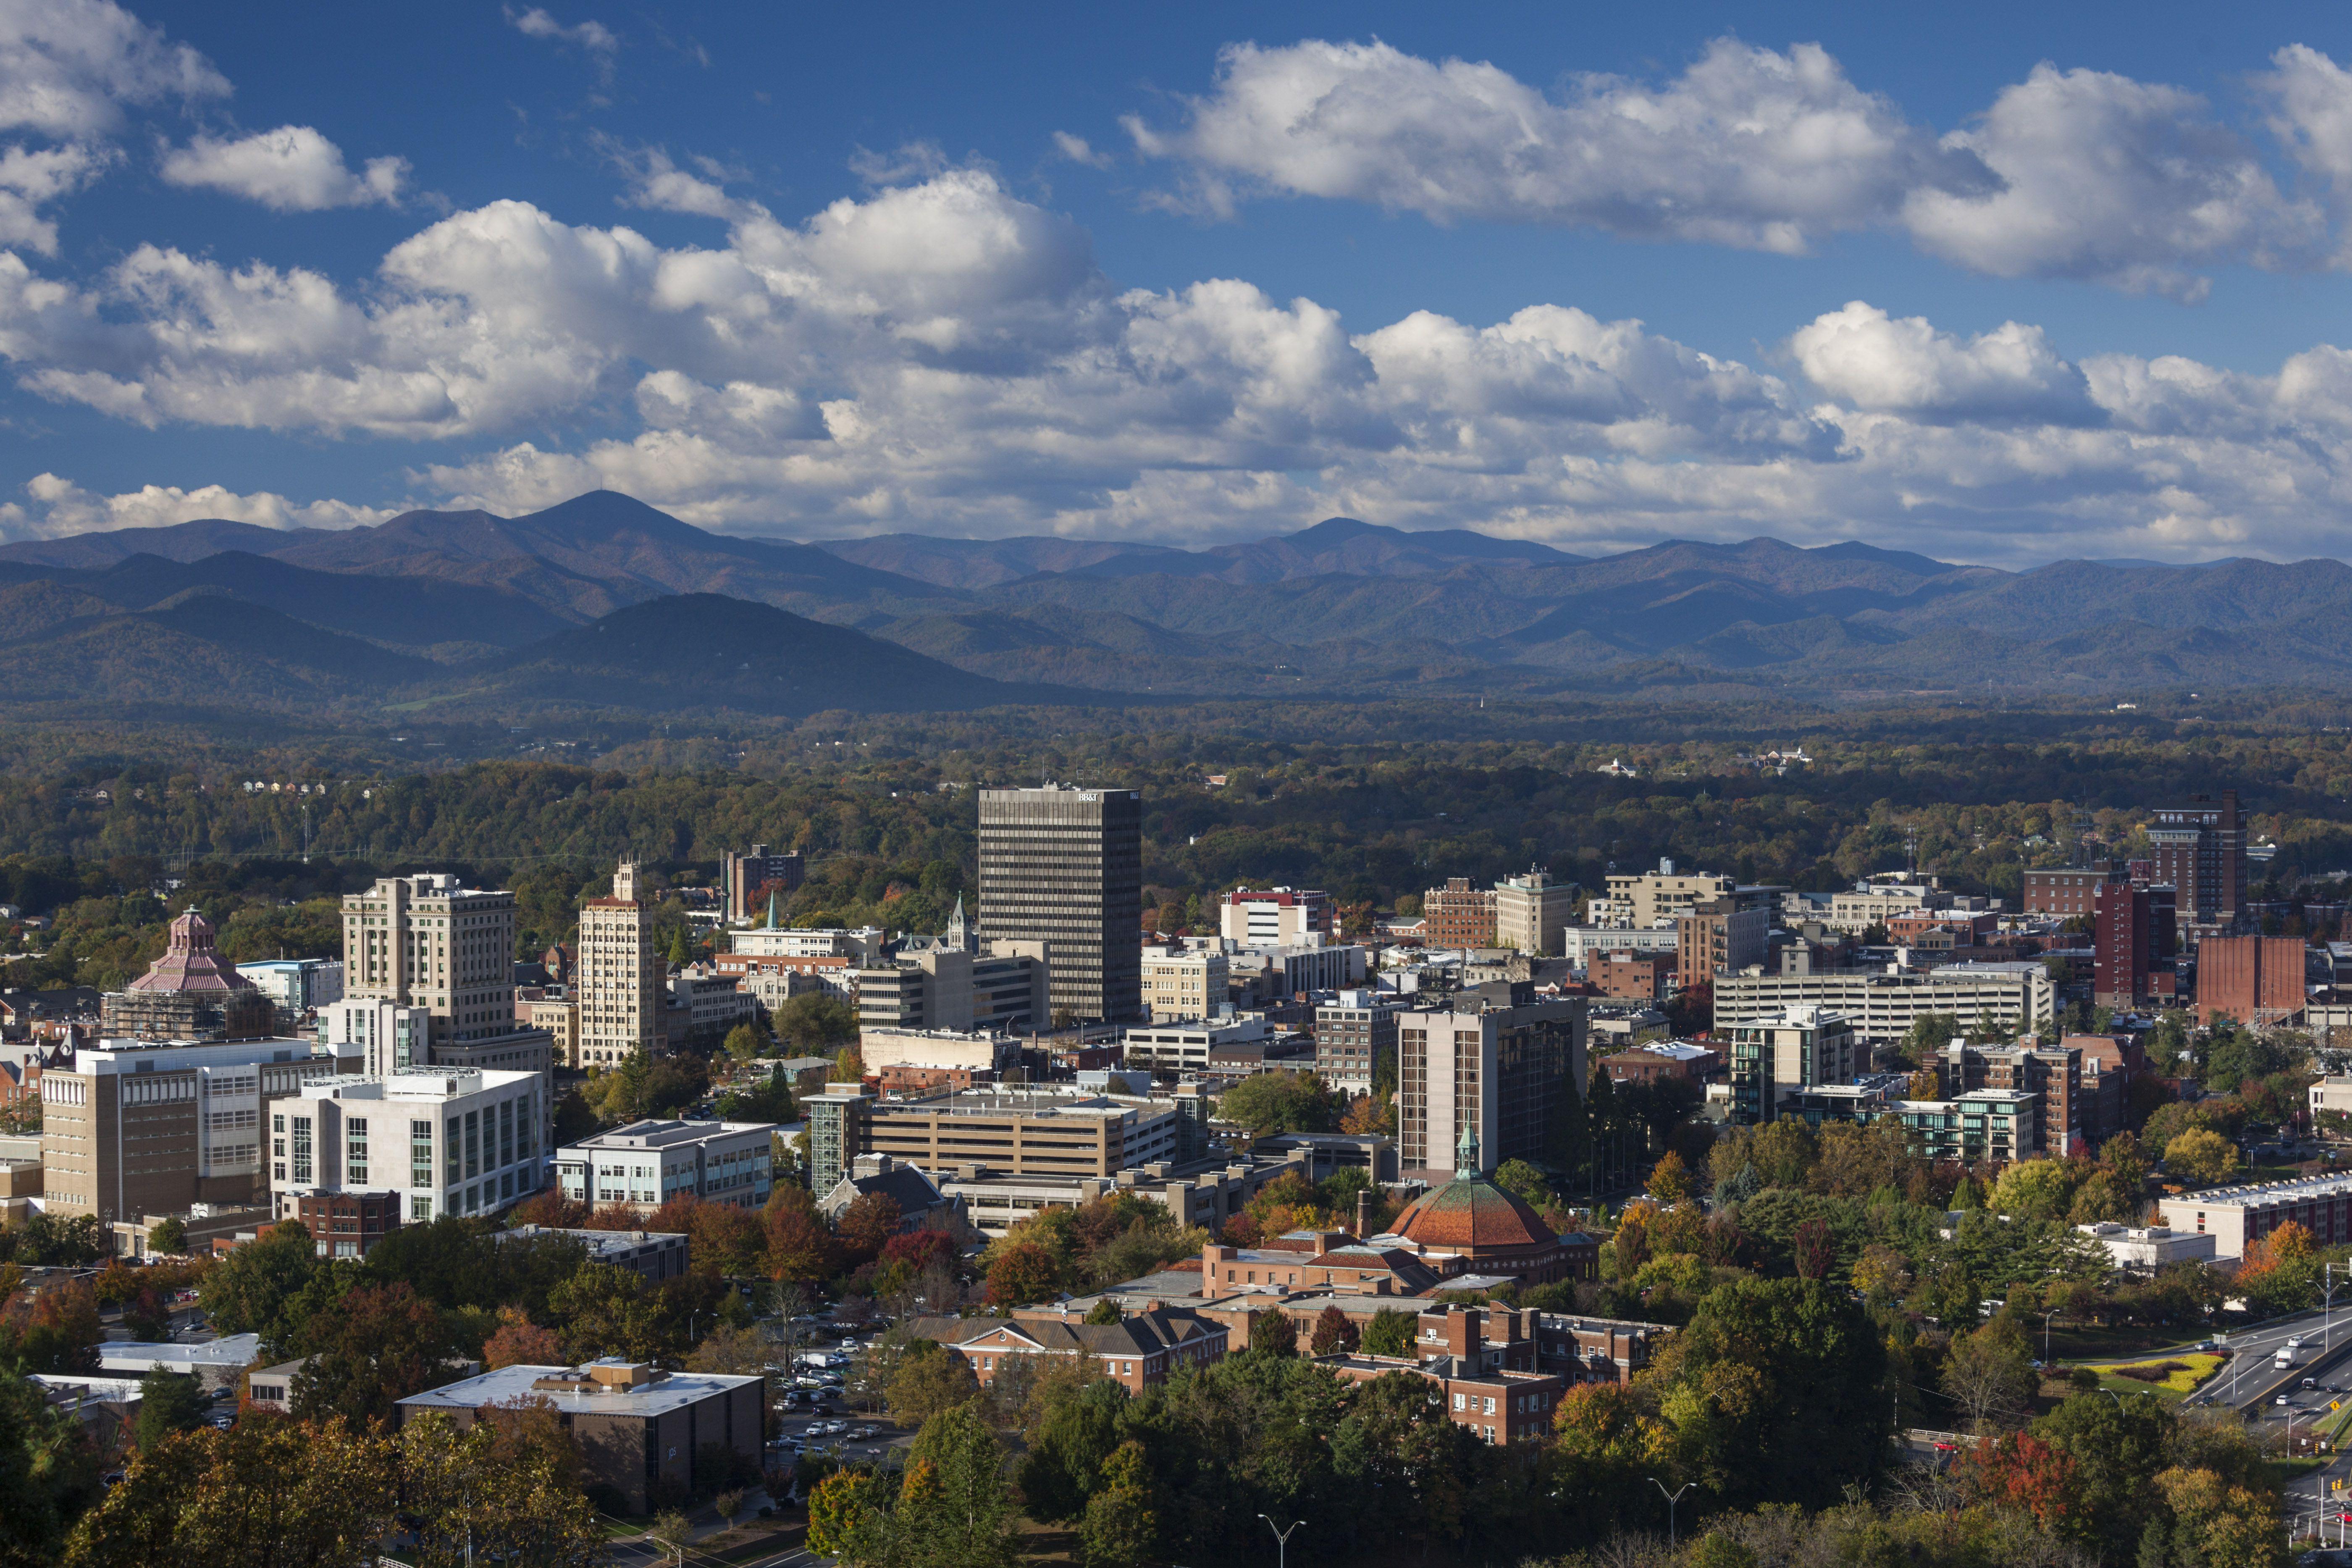 USA, North Carolina, Asheville, View of city on sunny day